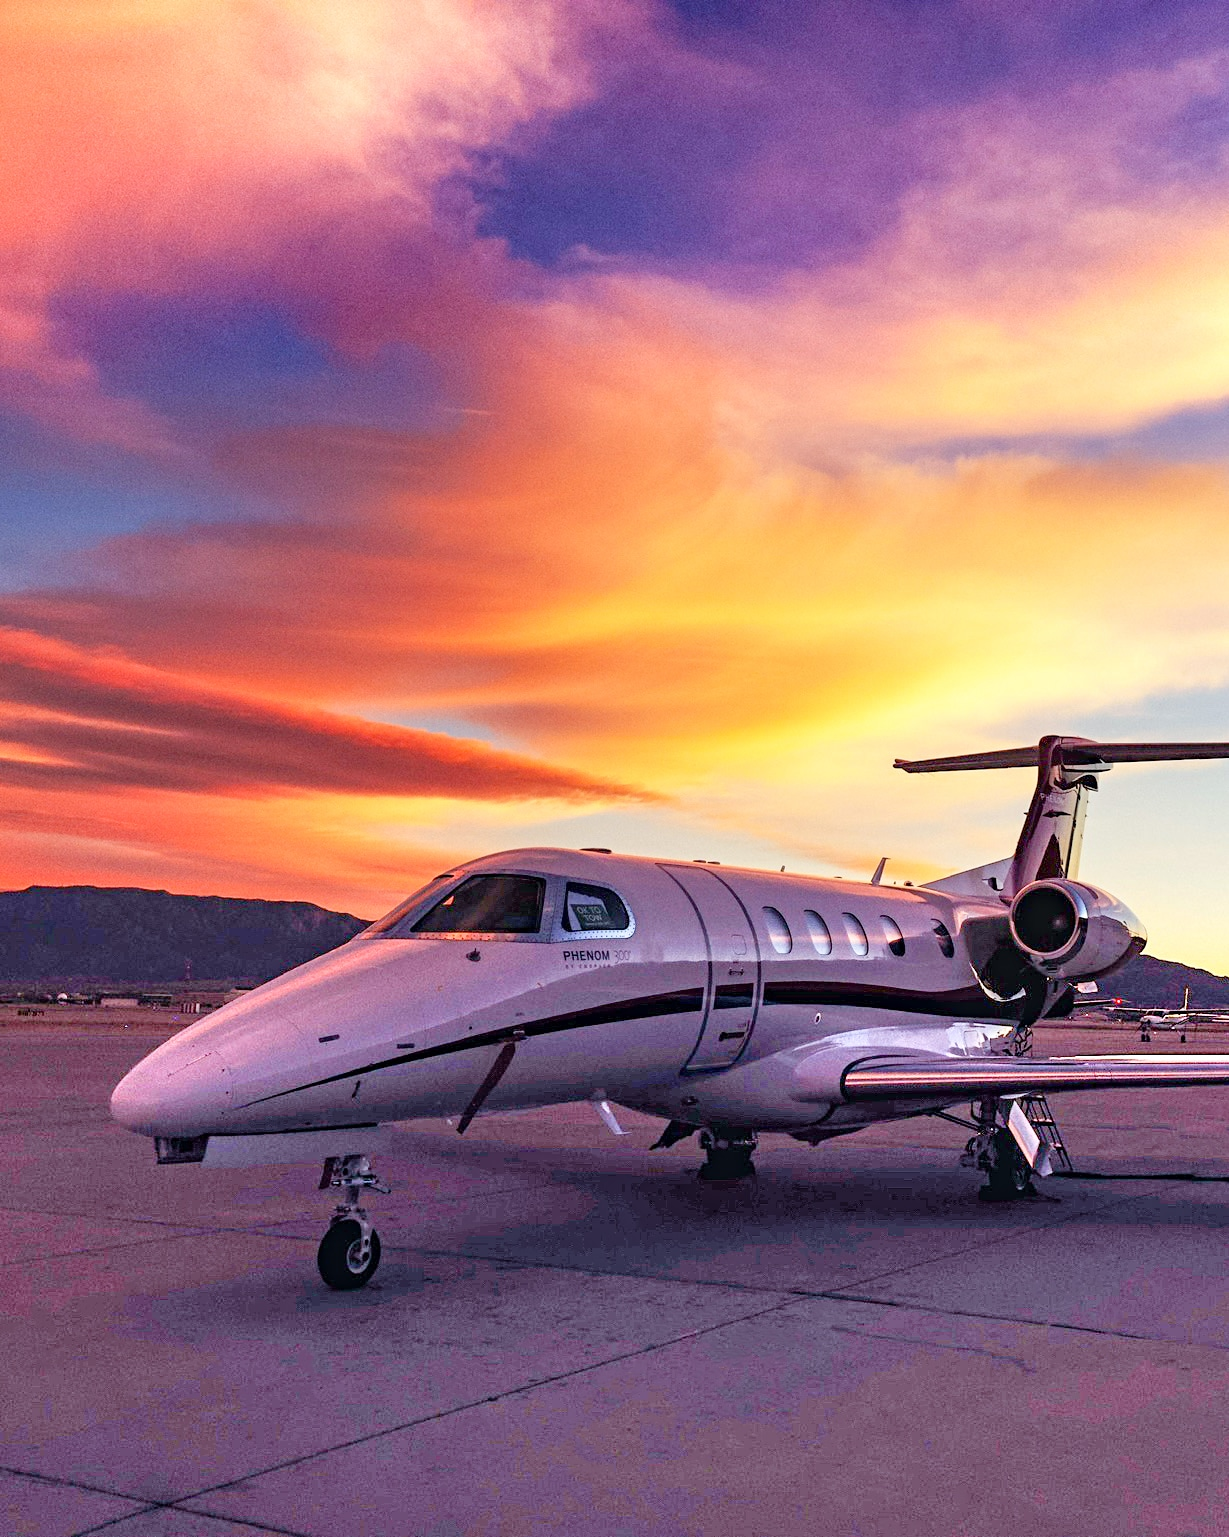 Embraer Phenom 300 on Tarmac at Sunset